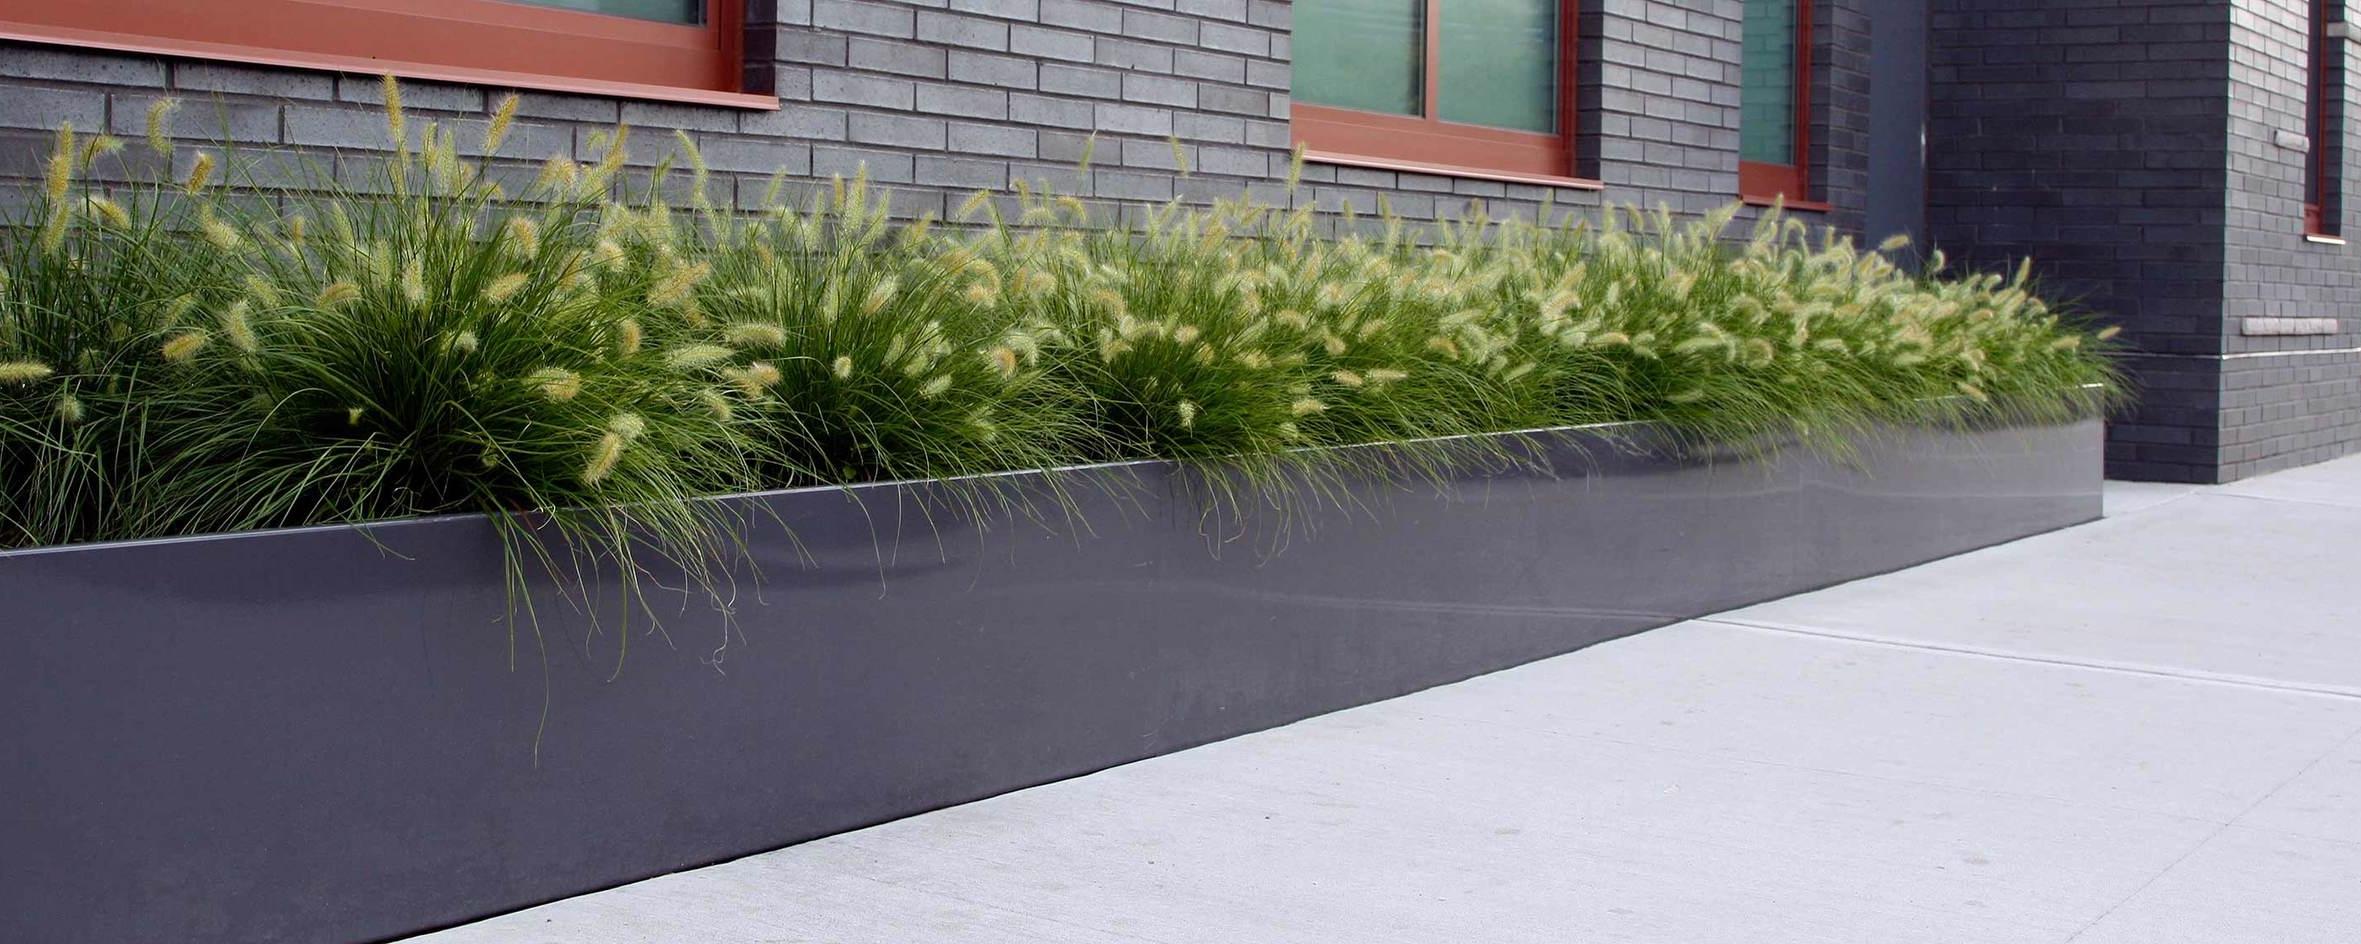 Brooklyn Condo RBA Group Planting Bed System Powder Coated Aluminum